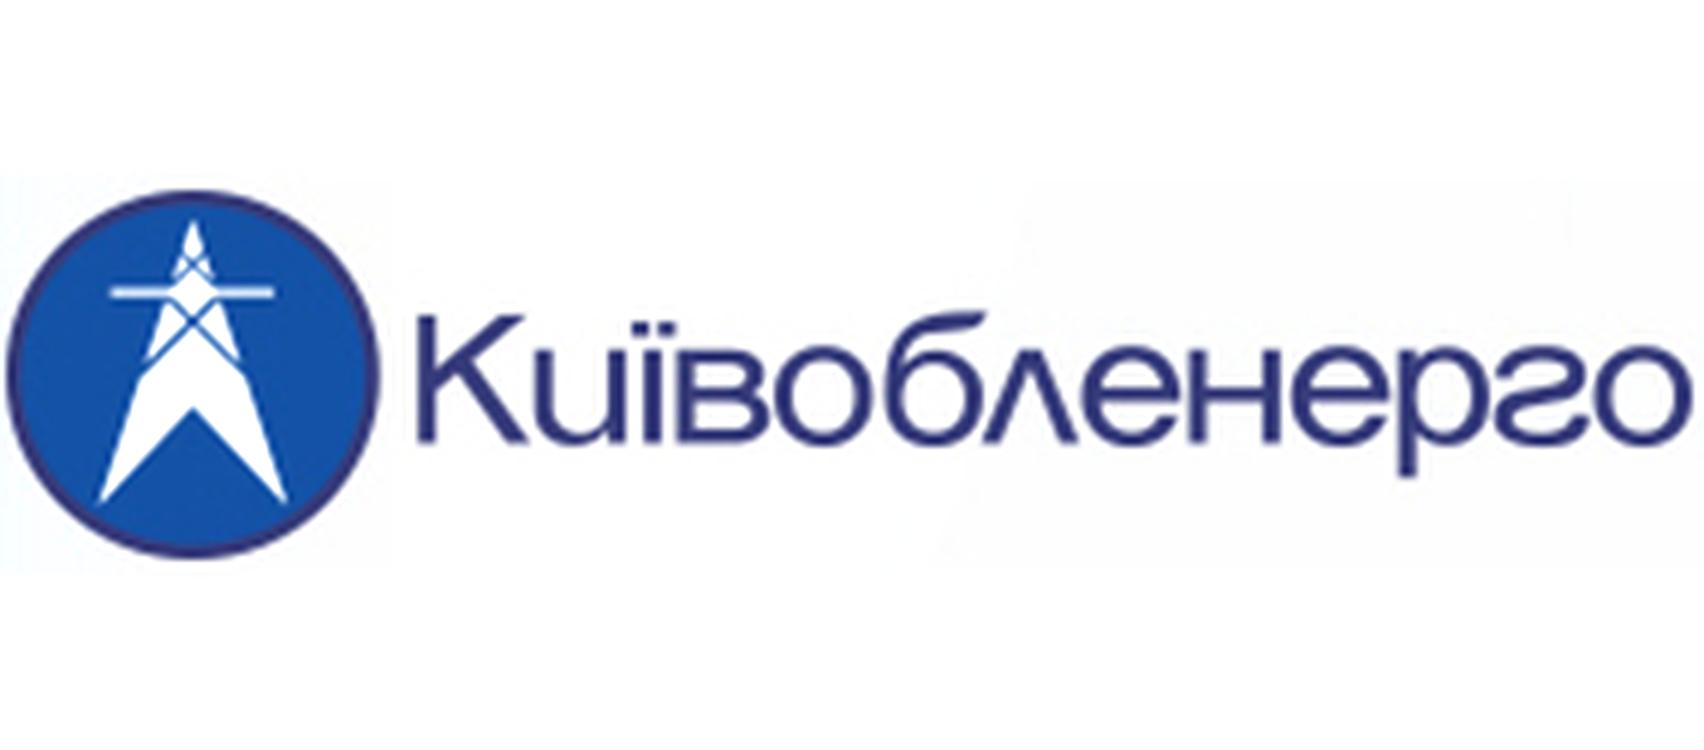 "ПАТ ""Київобленерго"" Вишгородський РЕМ  (p) (за послуги до 31.12.2018)"